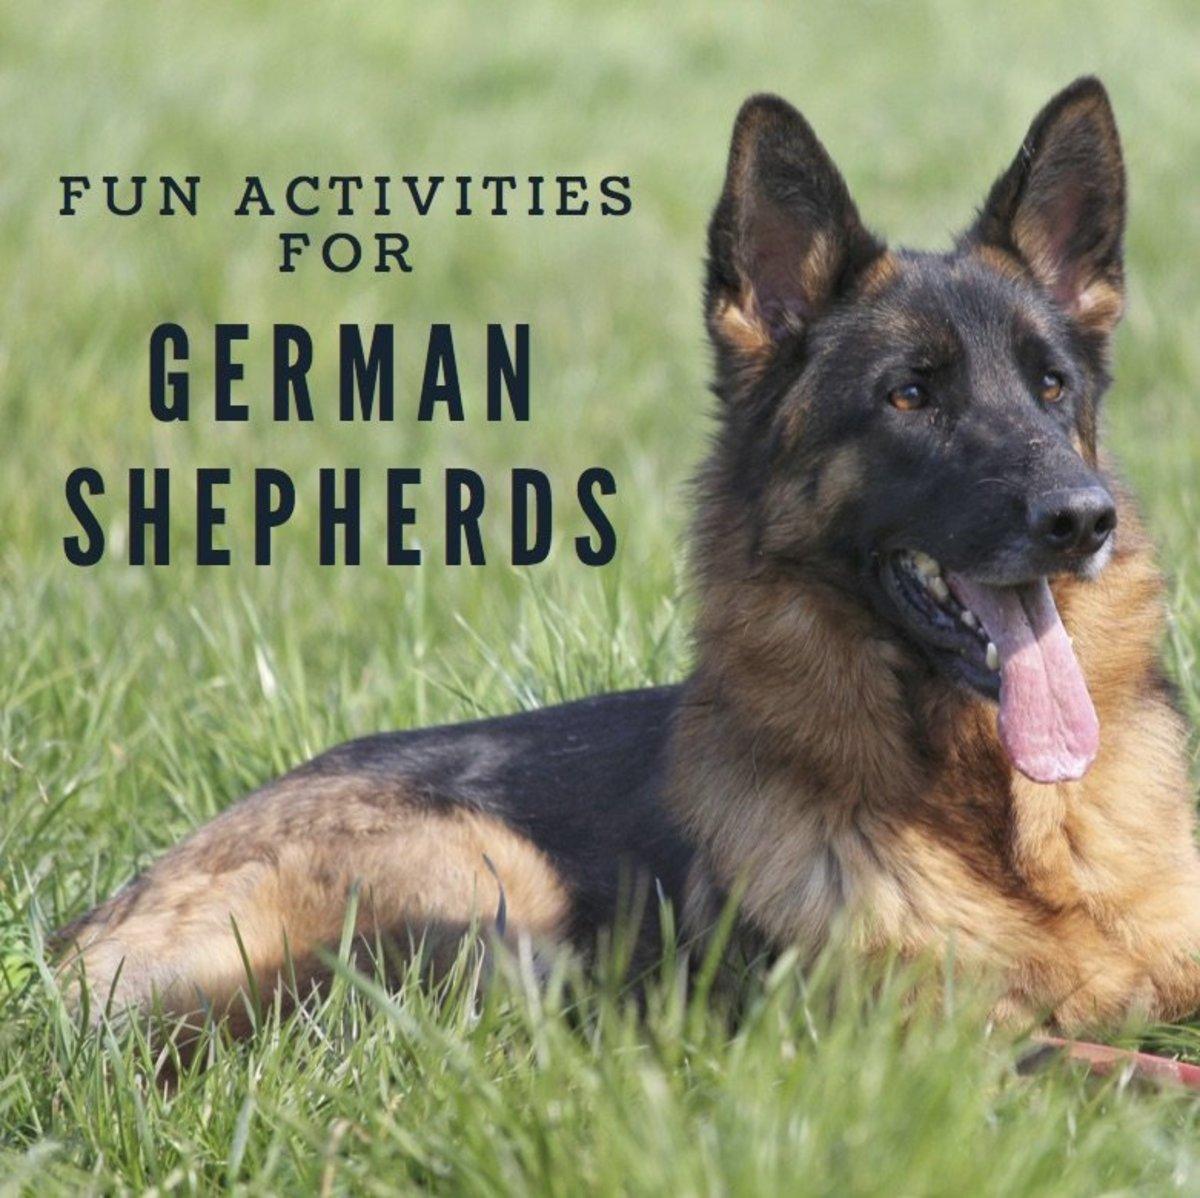 Fun Activities For German Shepherds Pethelpful